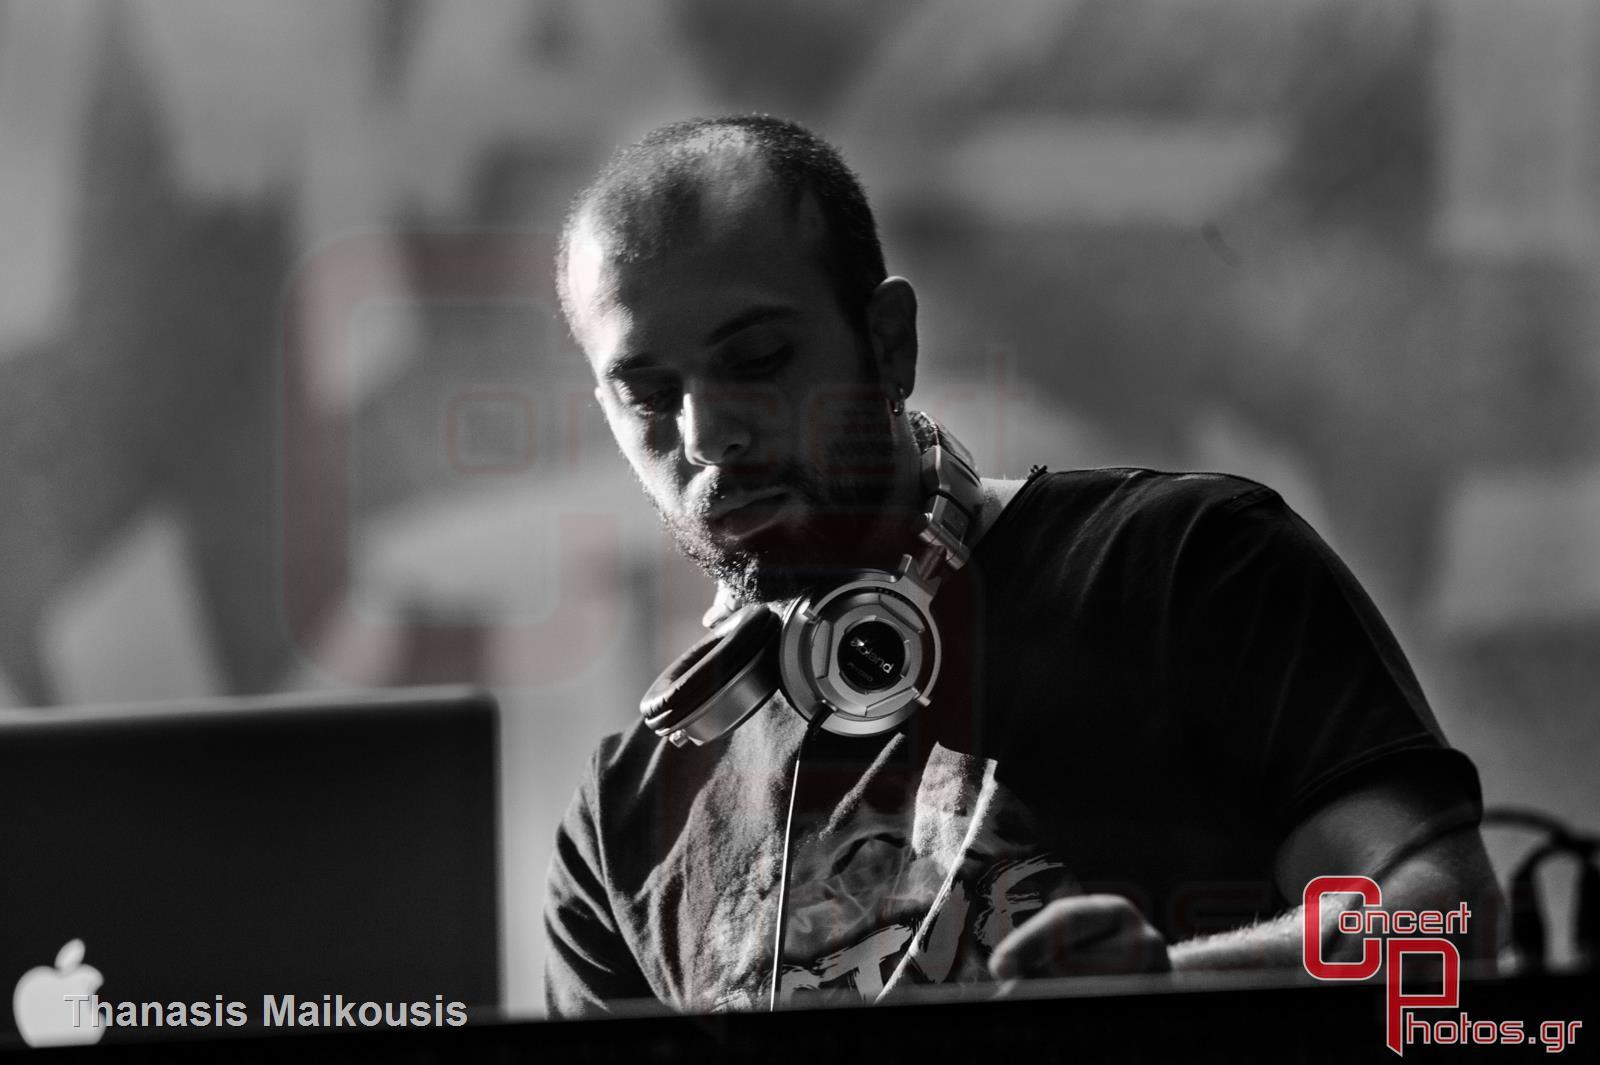 Active Member - Τραγούδα μας να φύγει το σκοτάδι- photographer: Thanasis Maikousis - concertphotos_-4987